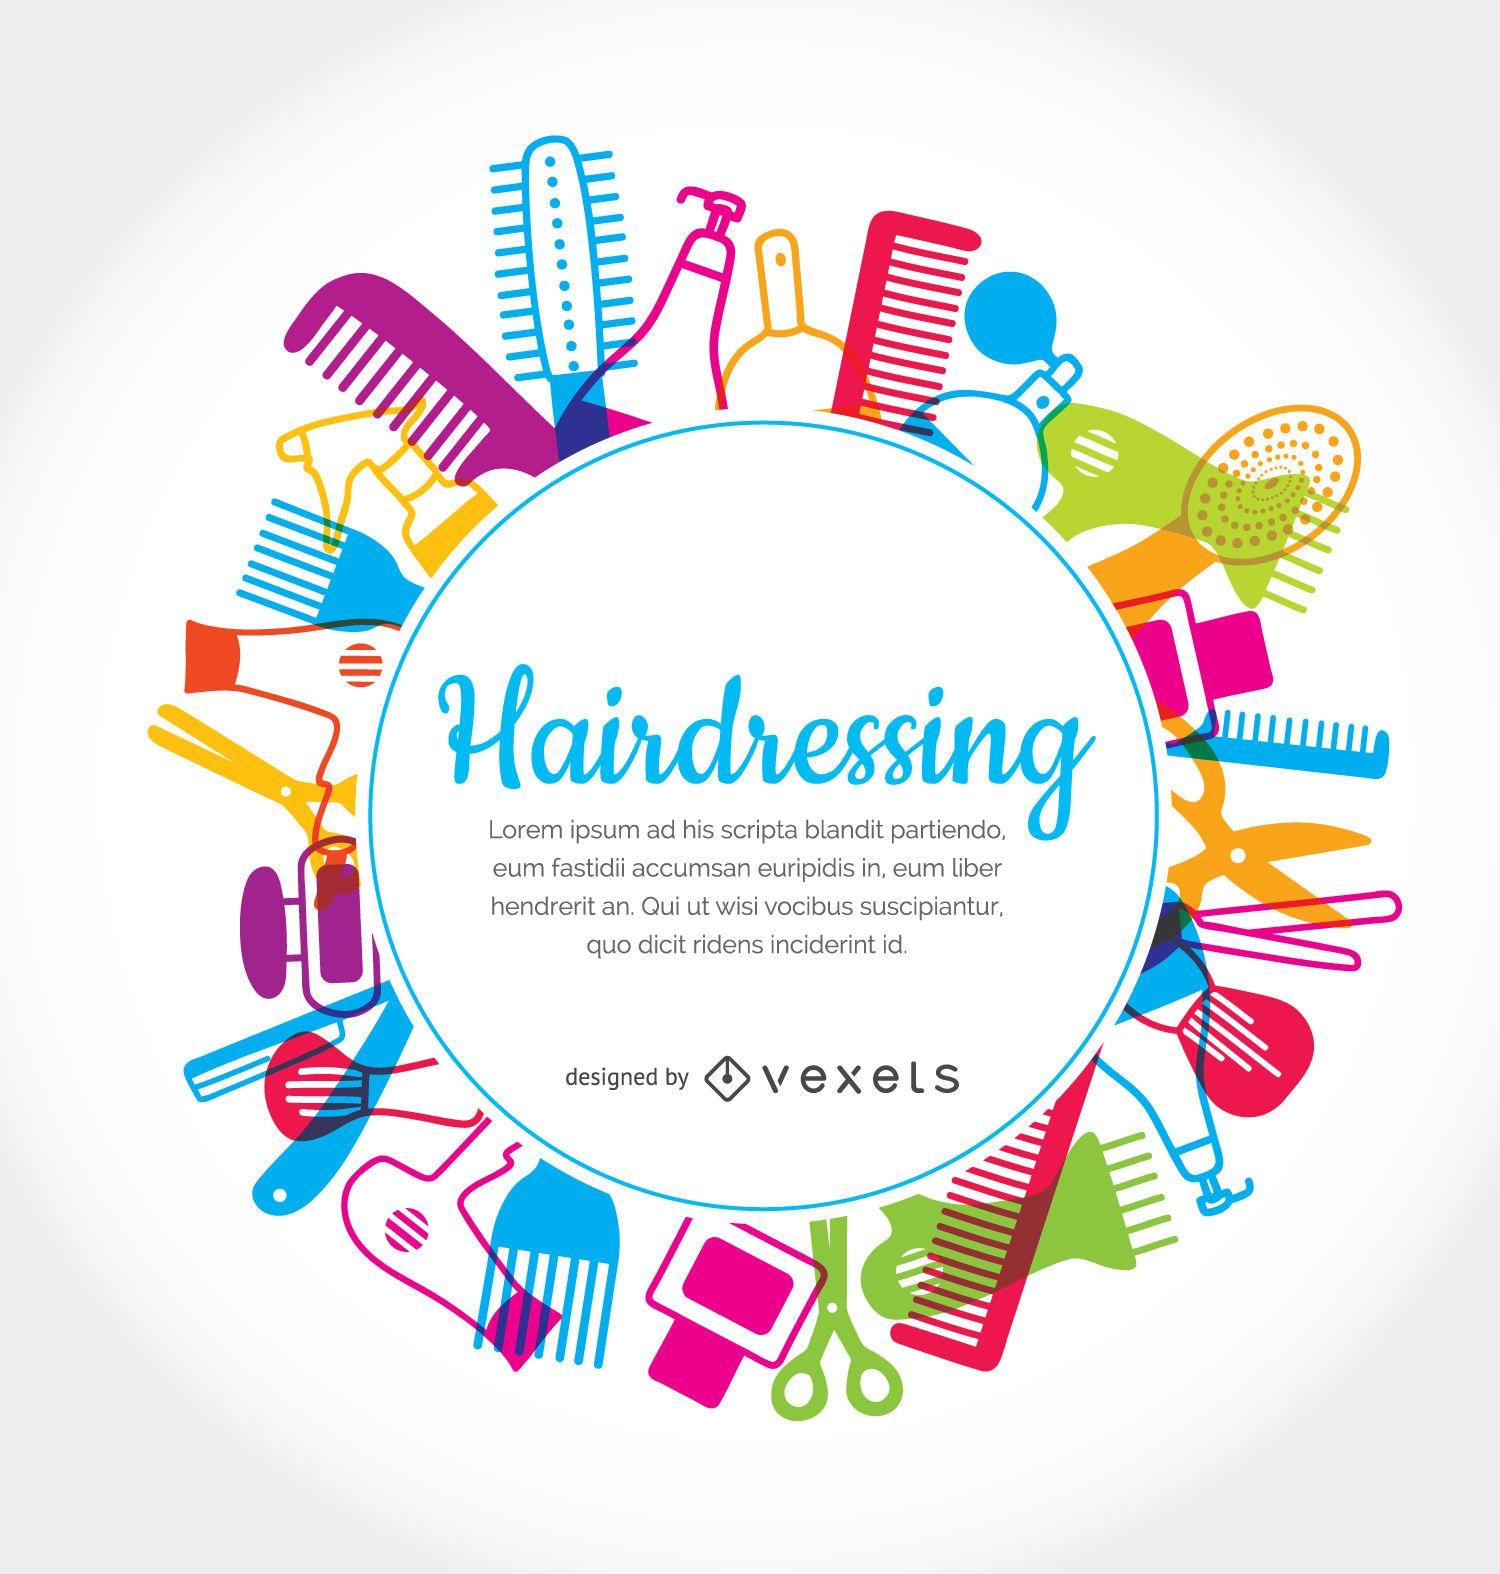 Hairdressing elements rounded frame